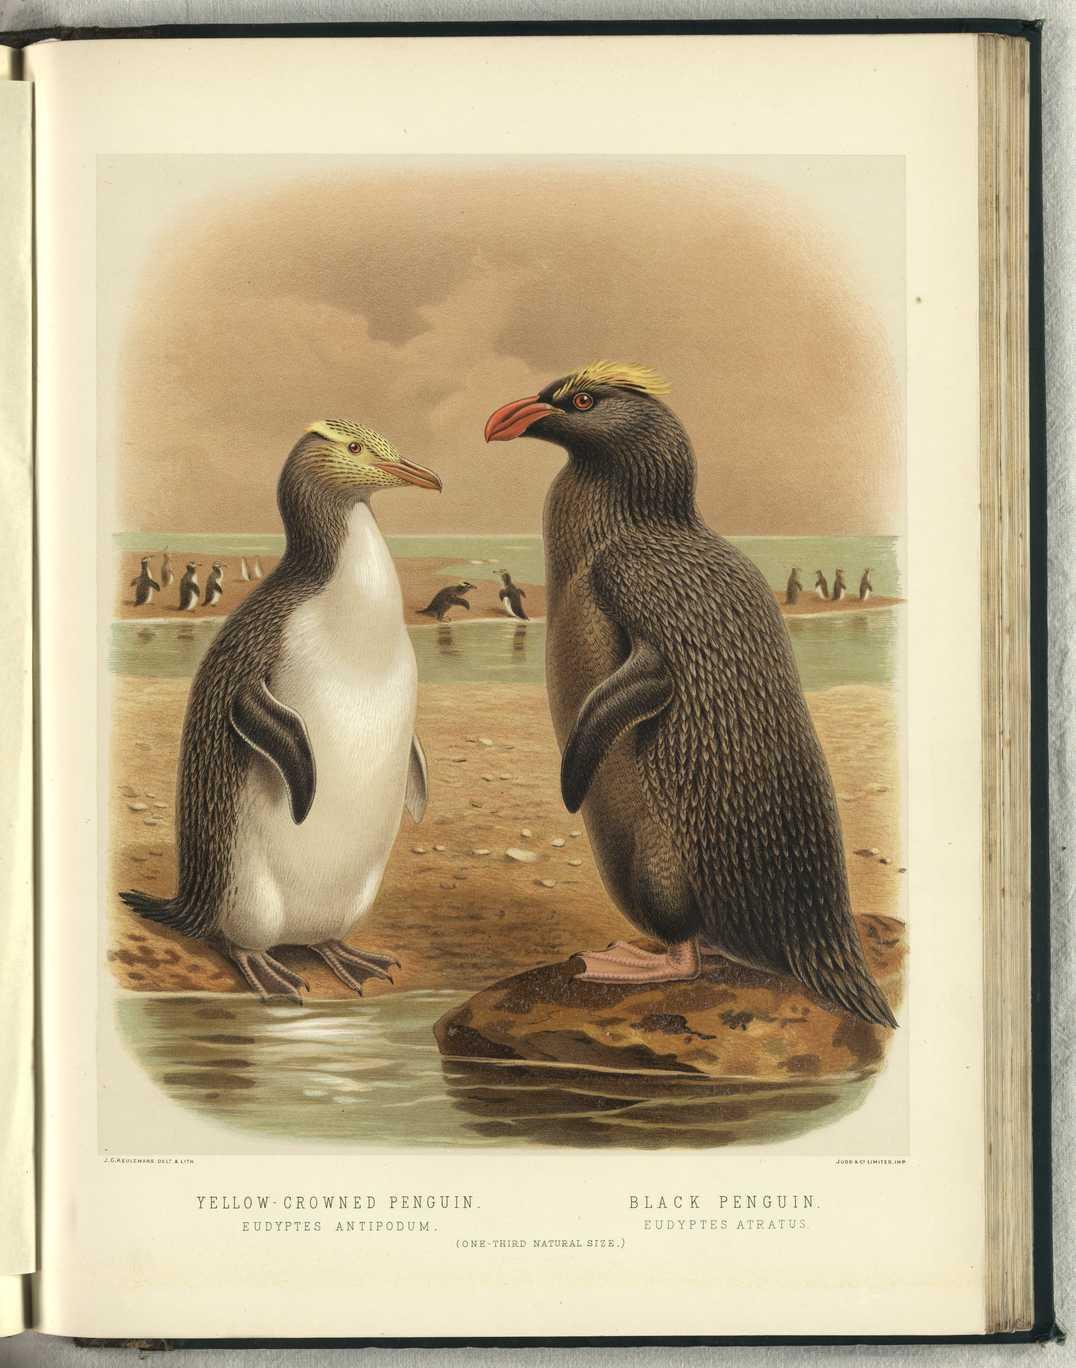 Erect-crested penguin wallpaper